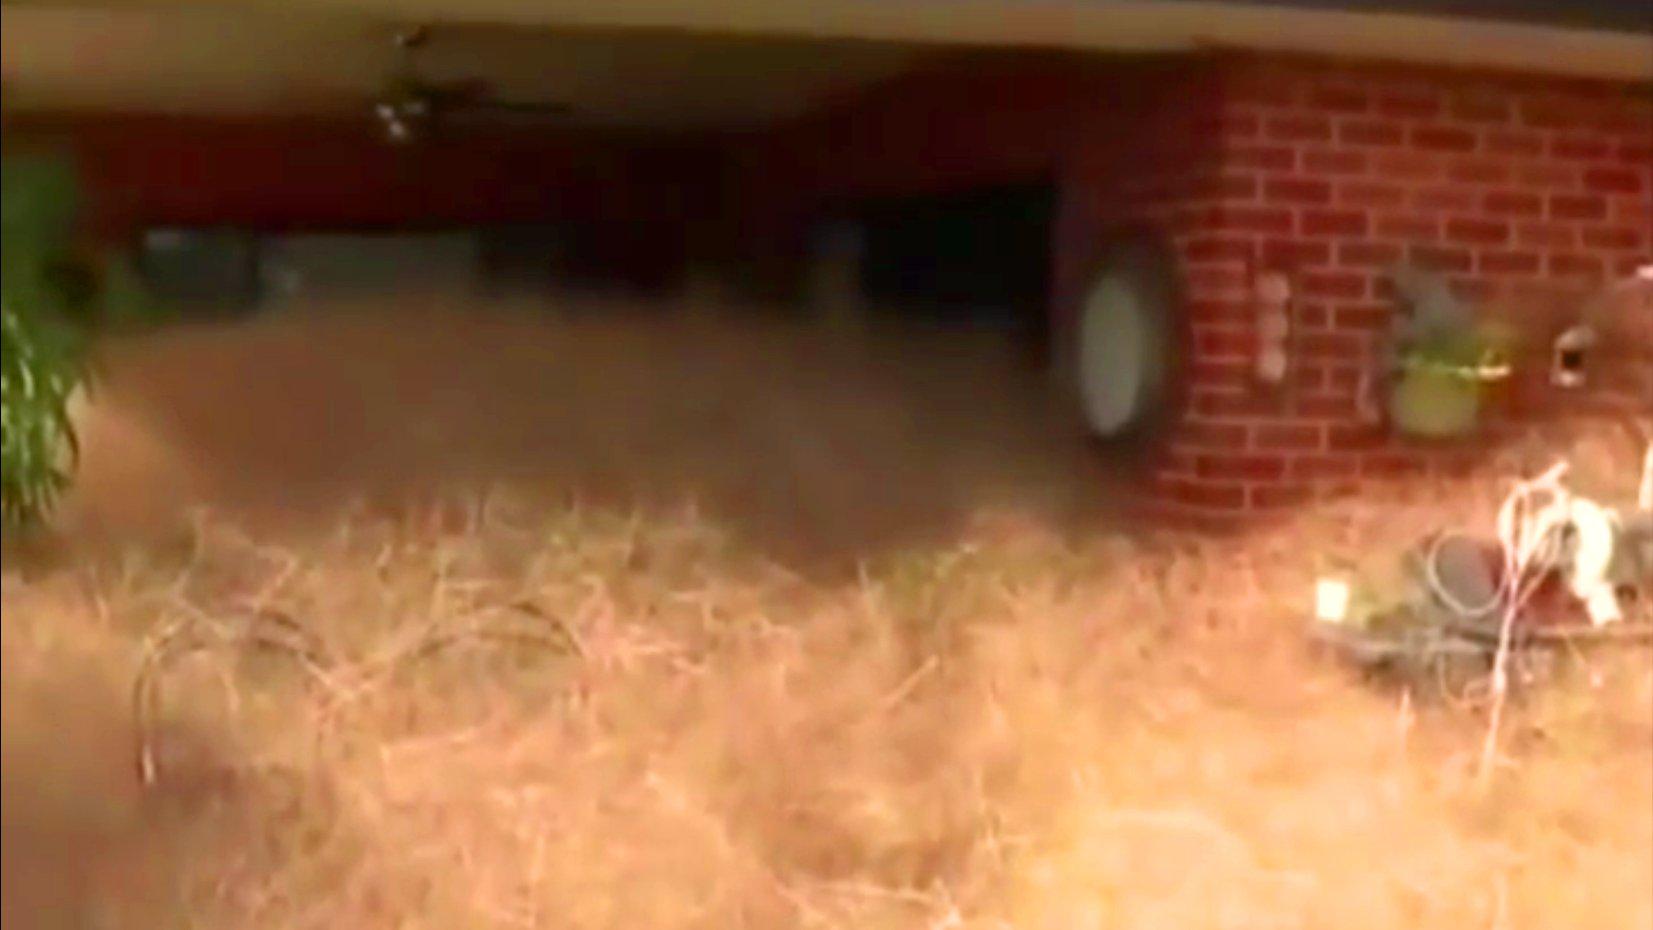 Gras-Plage in Australien, 2016 (Video)